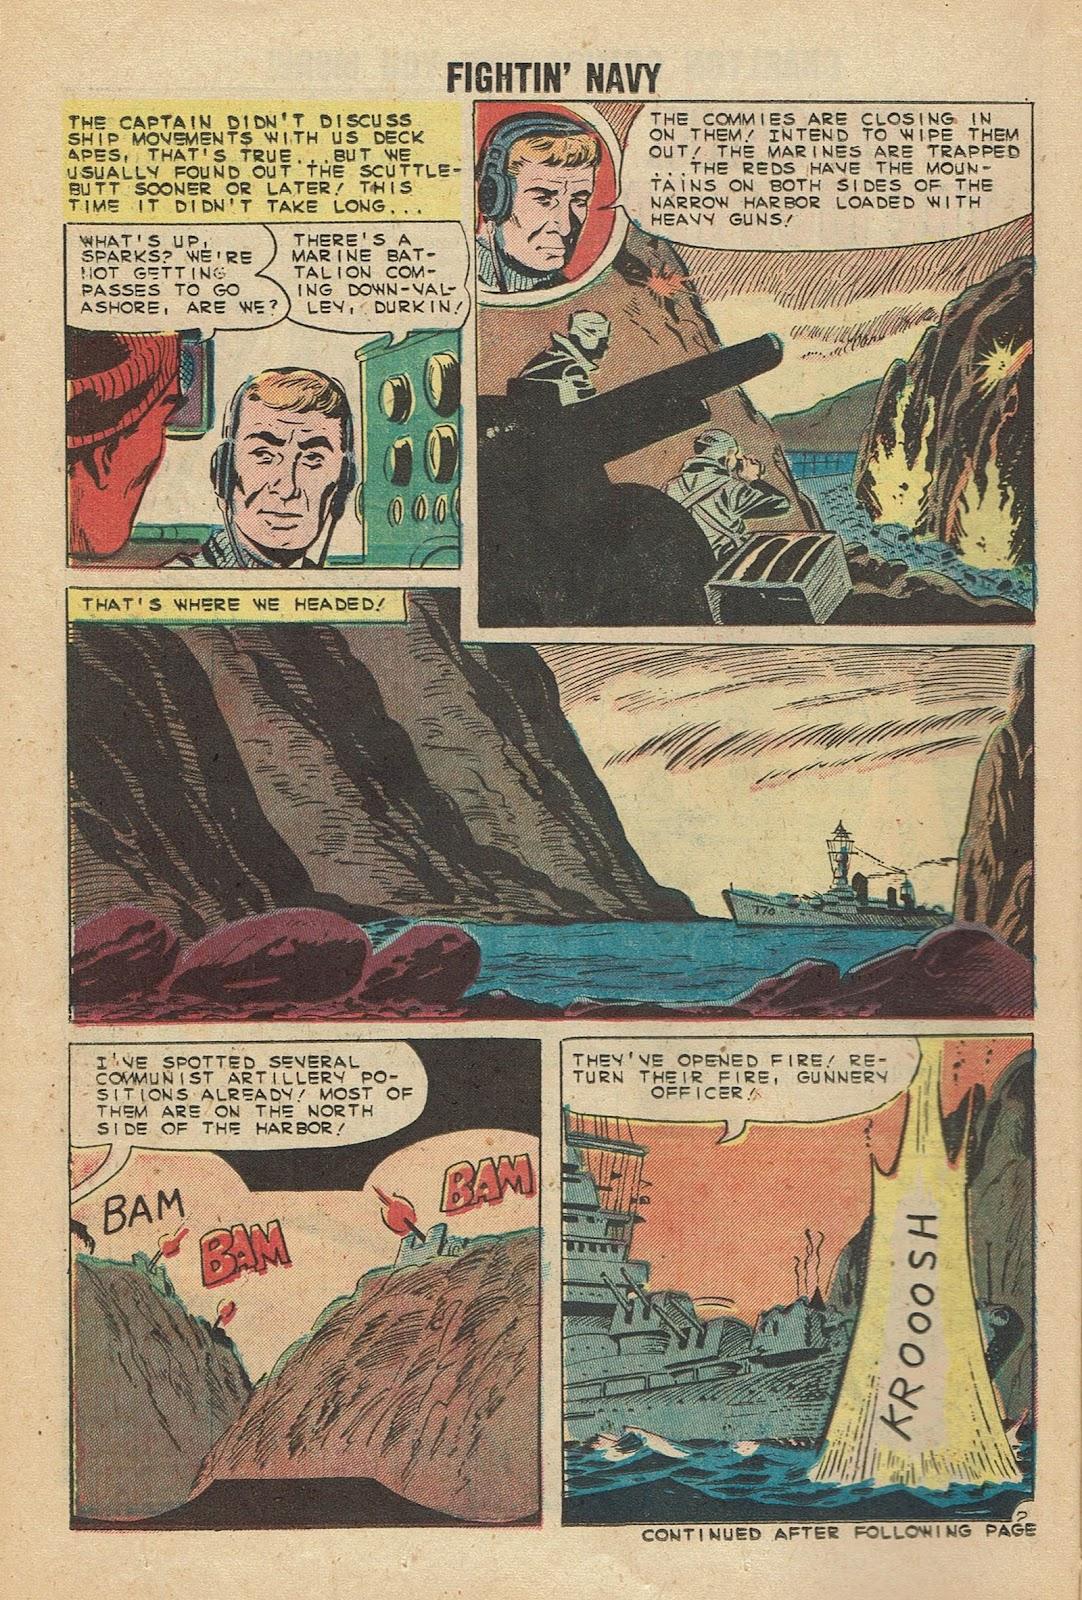 Read online Fightin' Navy comic -  Issue #96 - 14